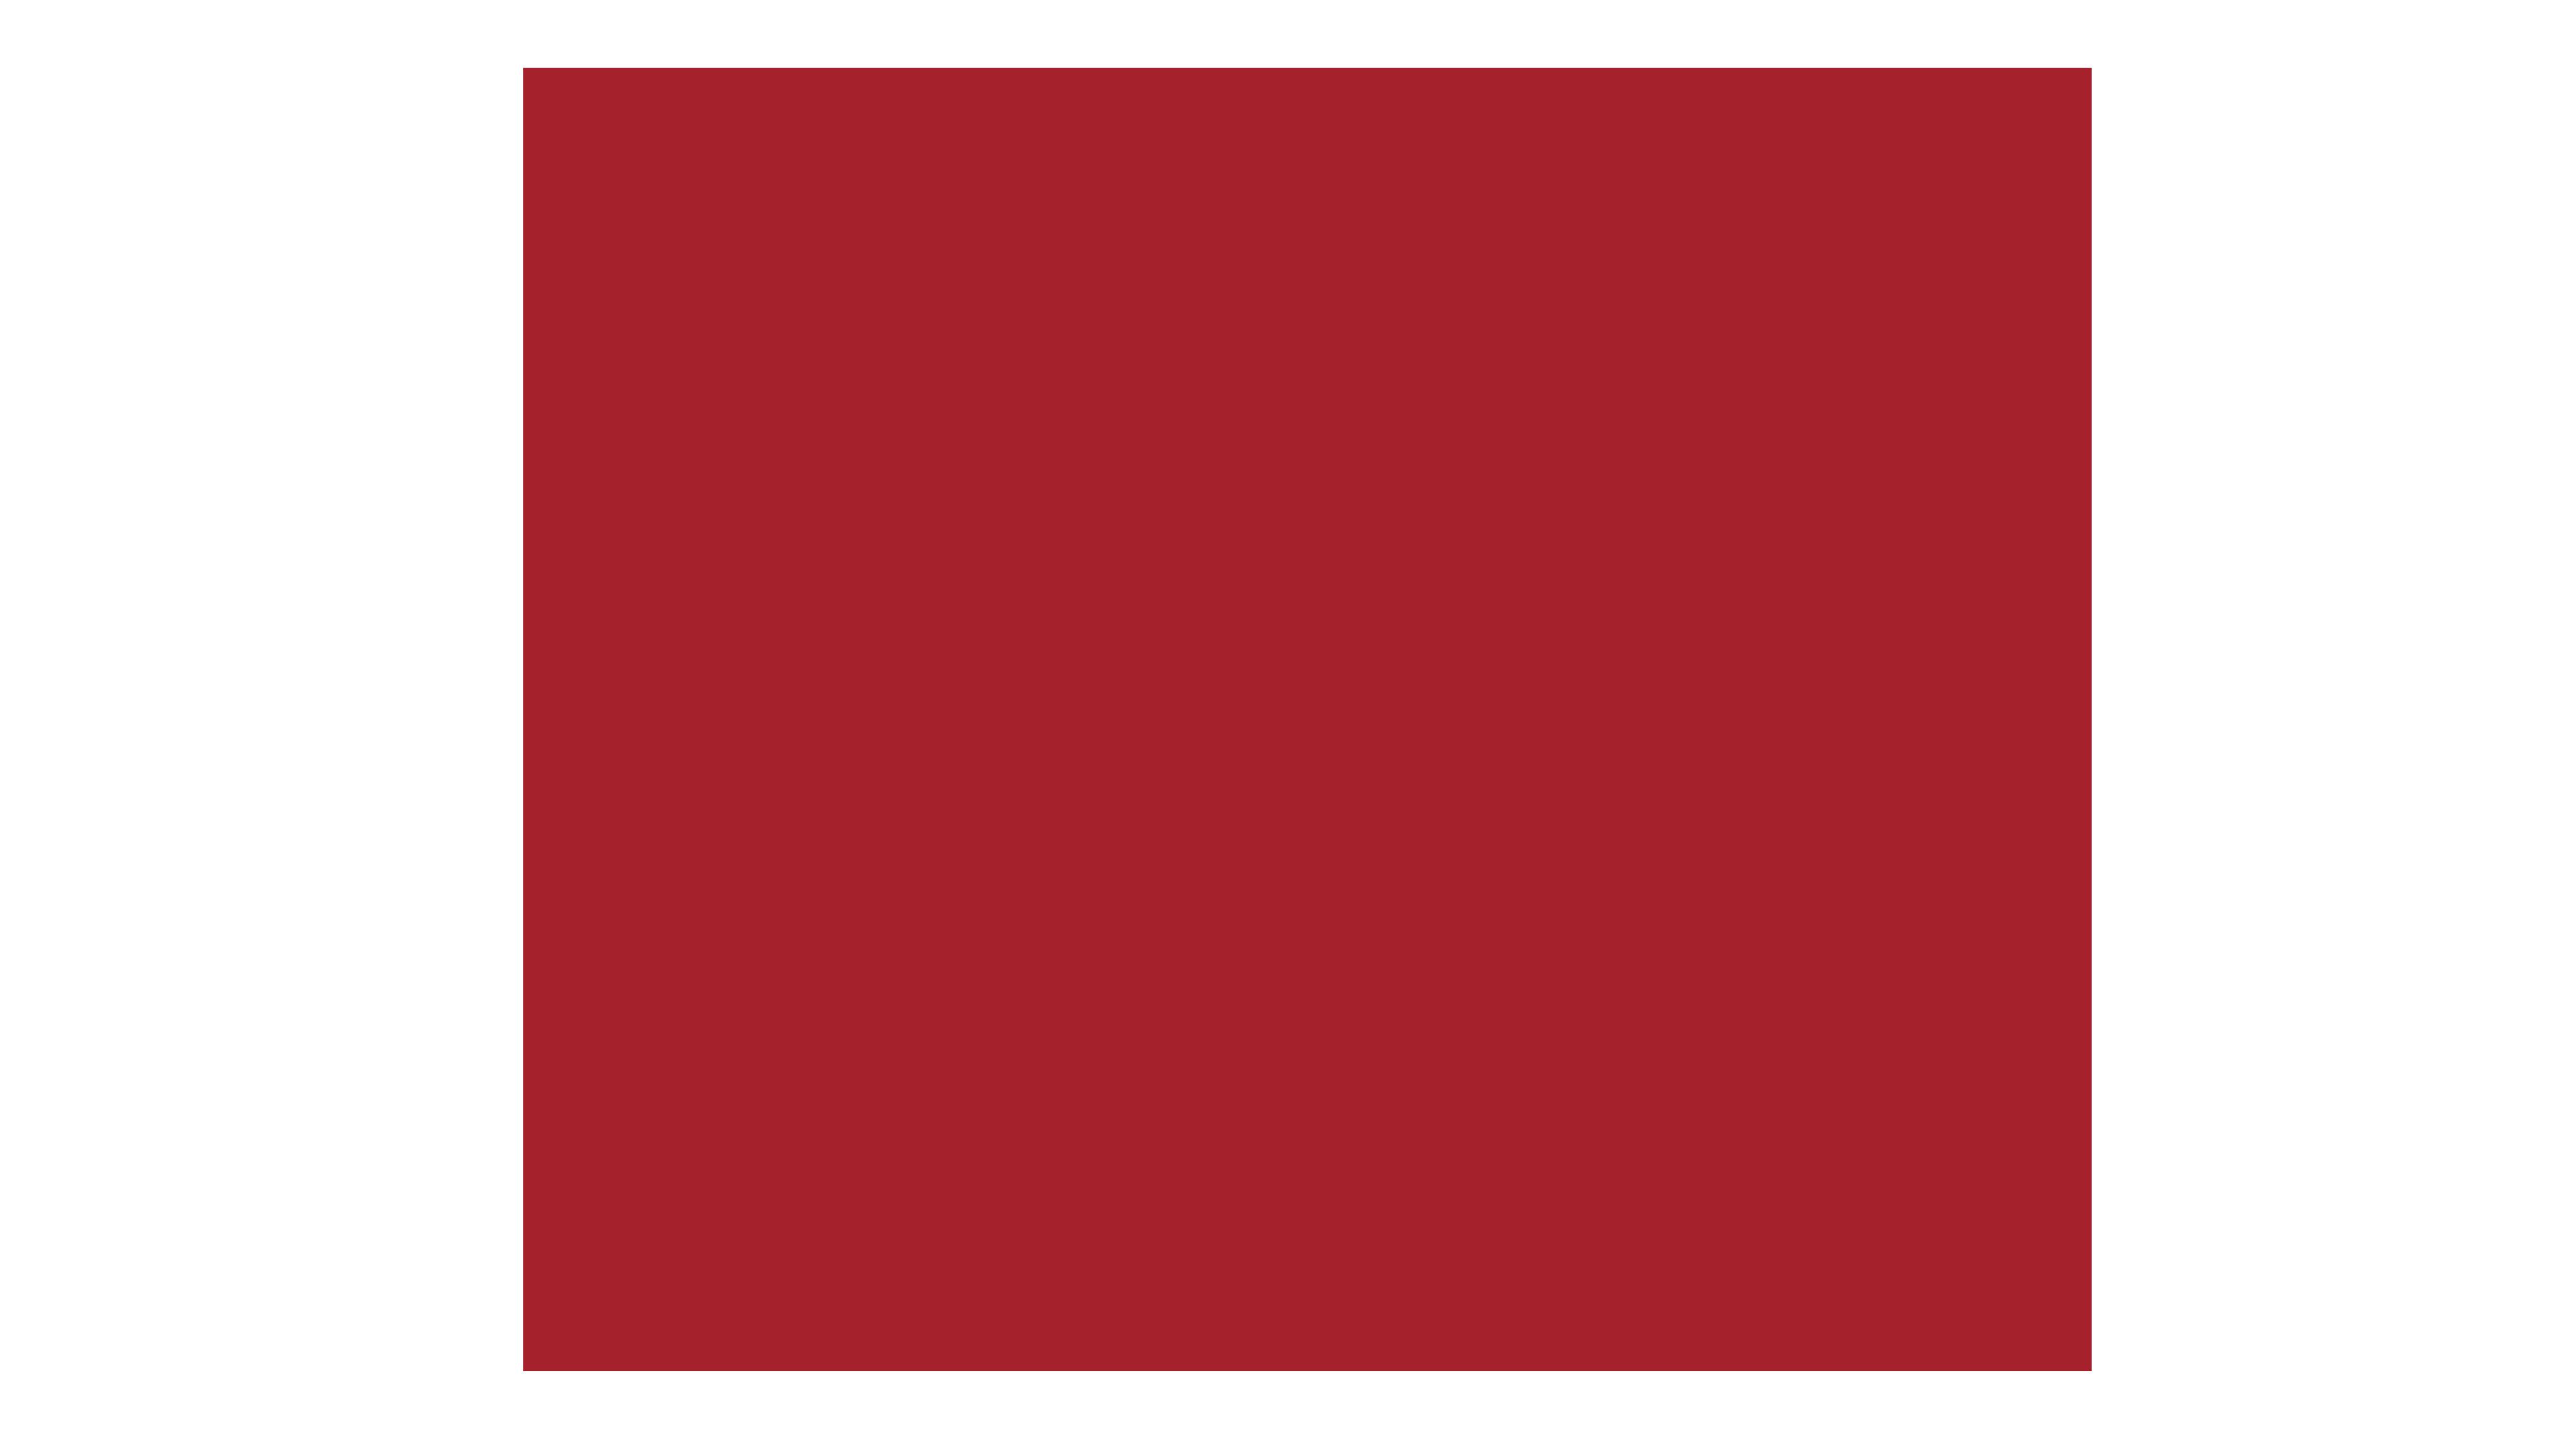 The Social Media Heroes